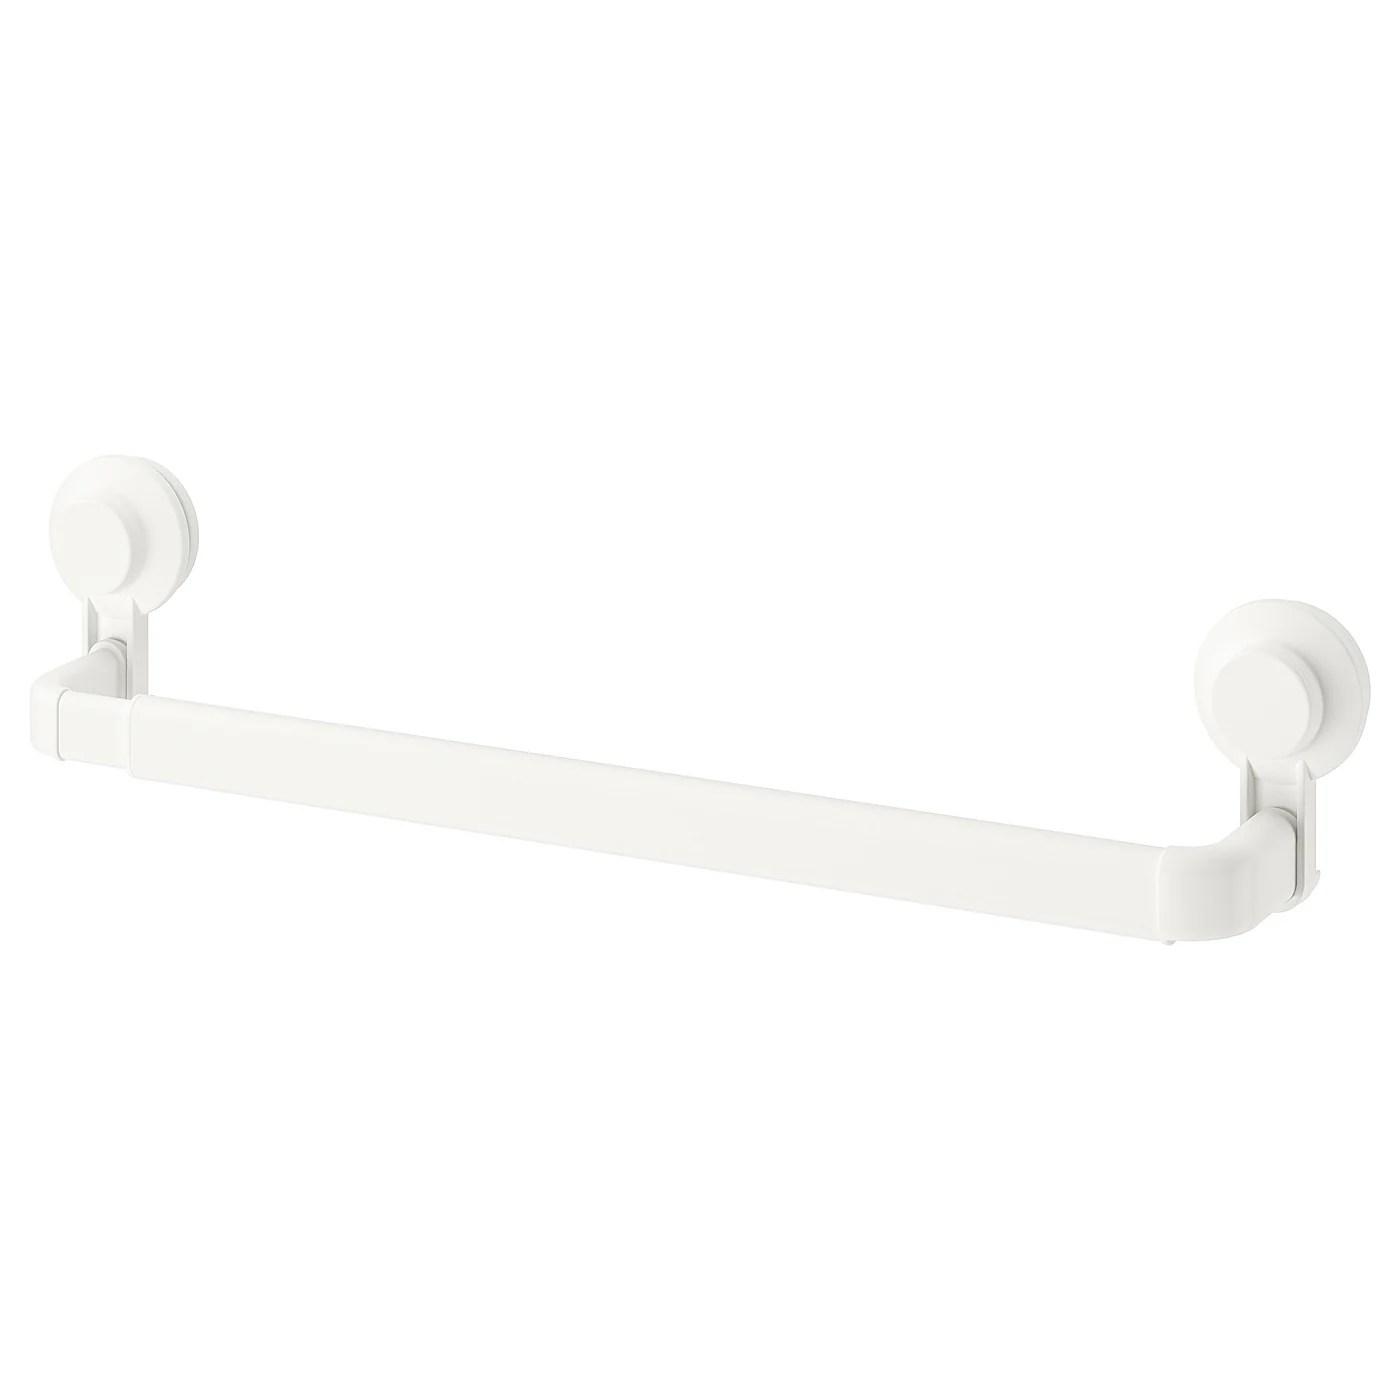 Tisken Porte Serviette A Ventouse Blanc Ikea